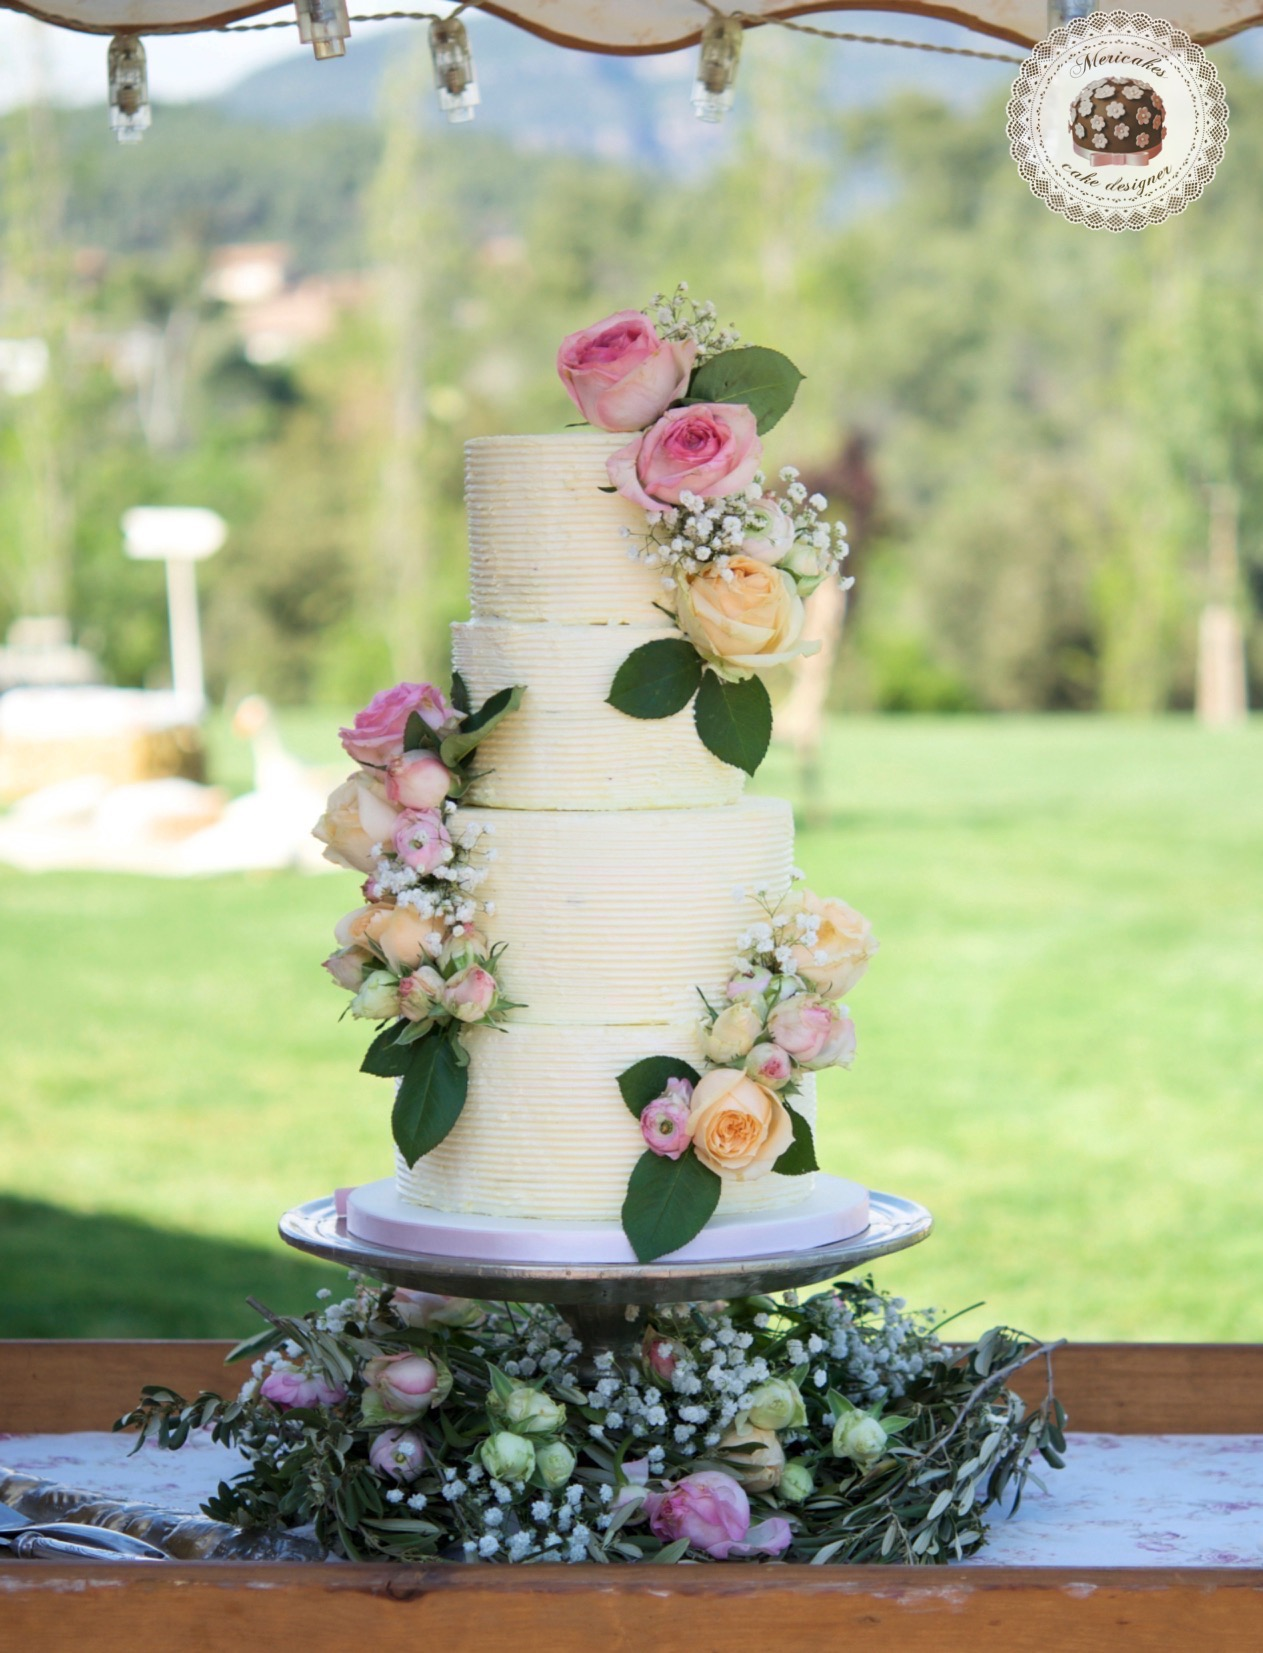 Cream wedding cake, tarta de boda, stripes, fres flowers cake, mericakes, spain wedding, bodas barcelona, can ribas, red velvet, roses, mascarpone, swiss buttercream, barcelona, bodas reales 9